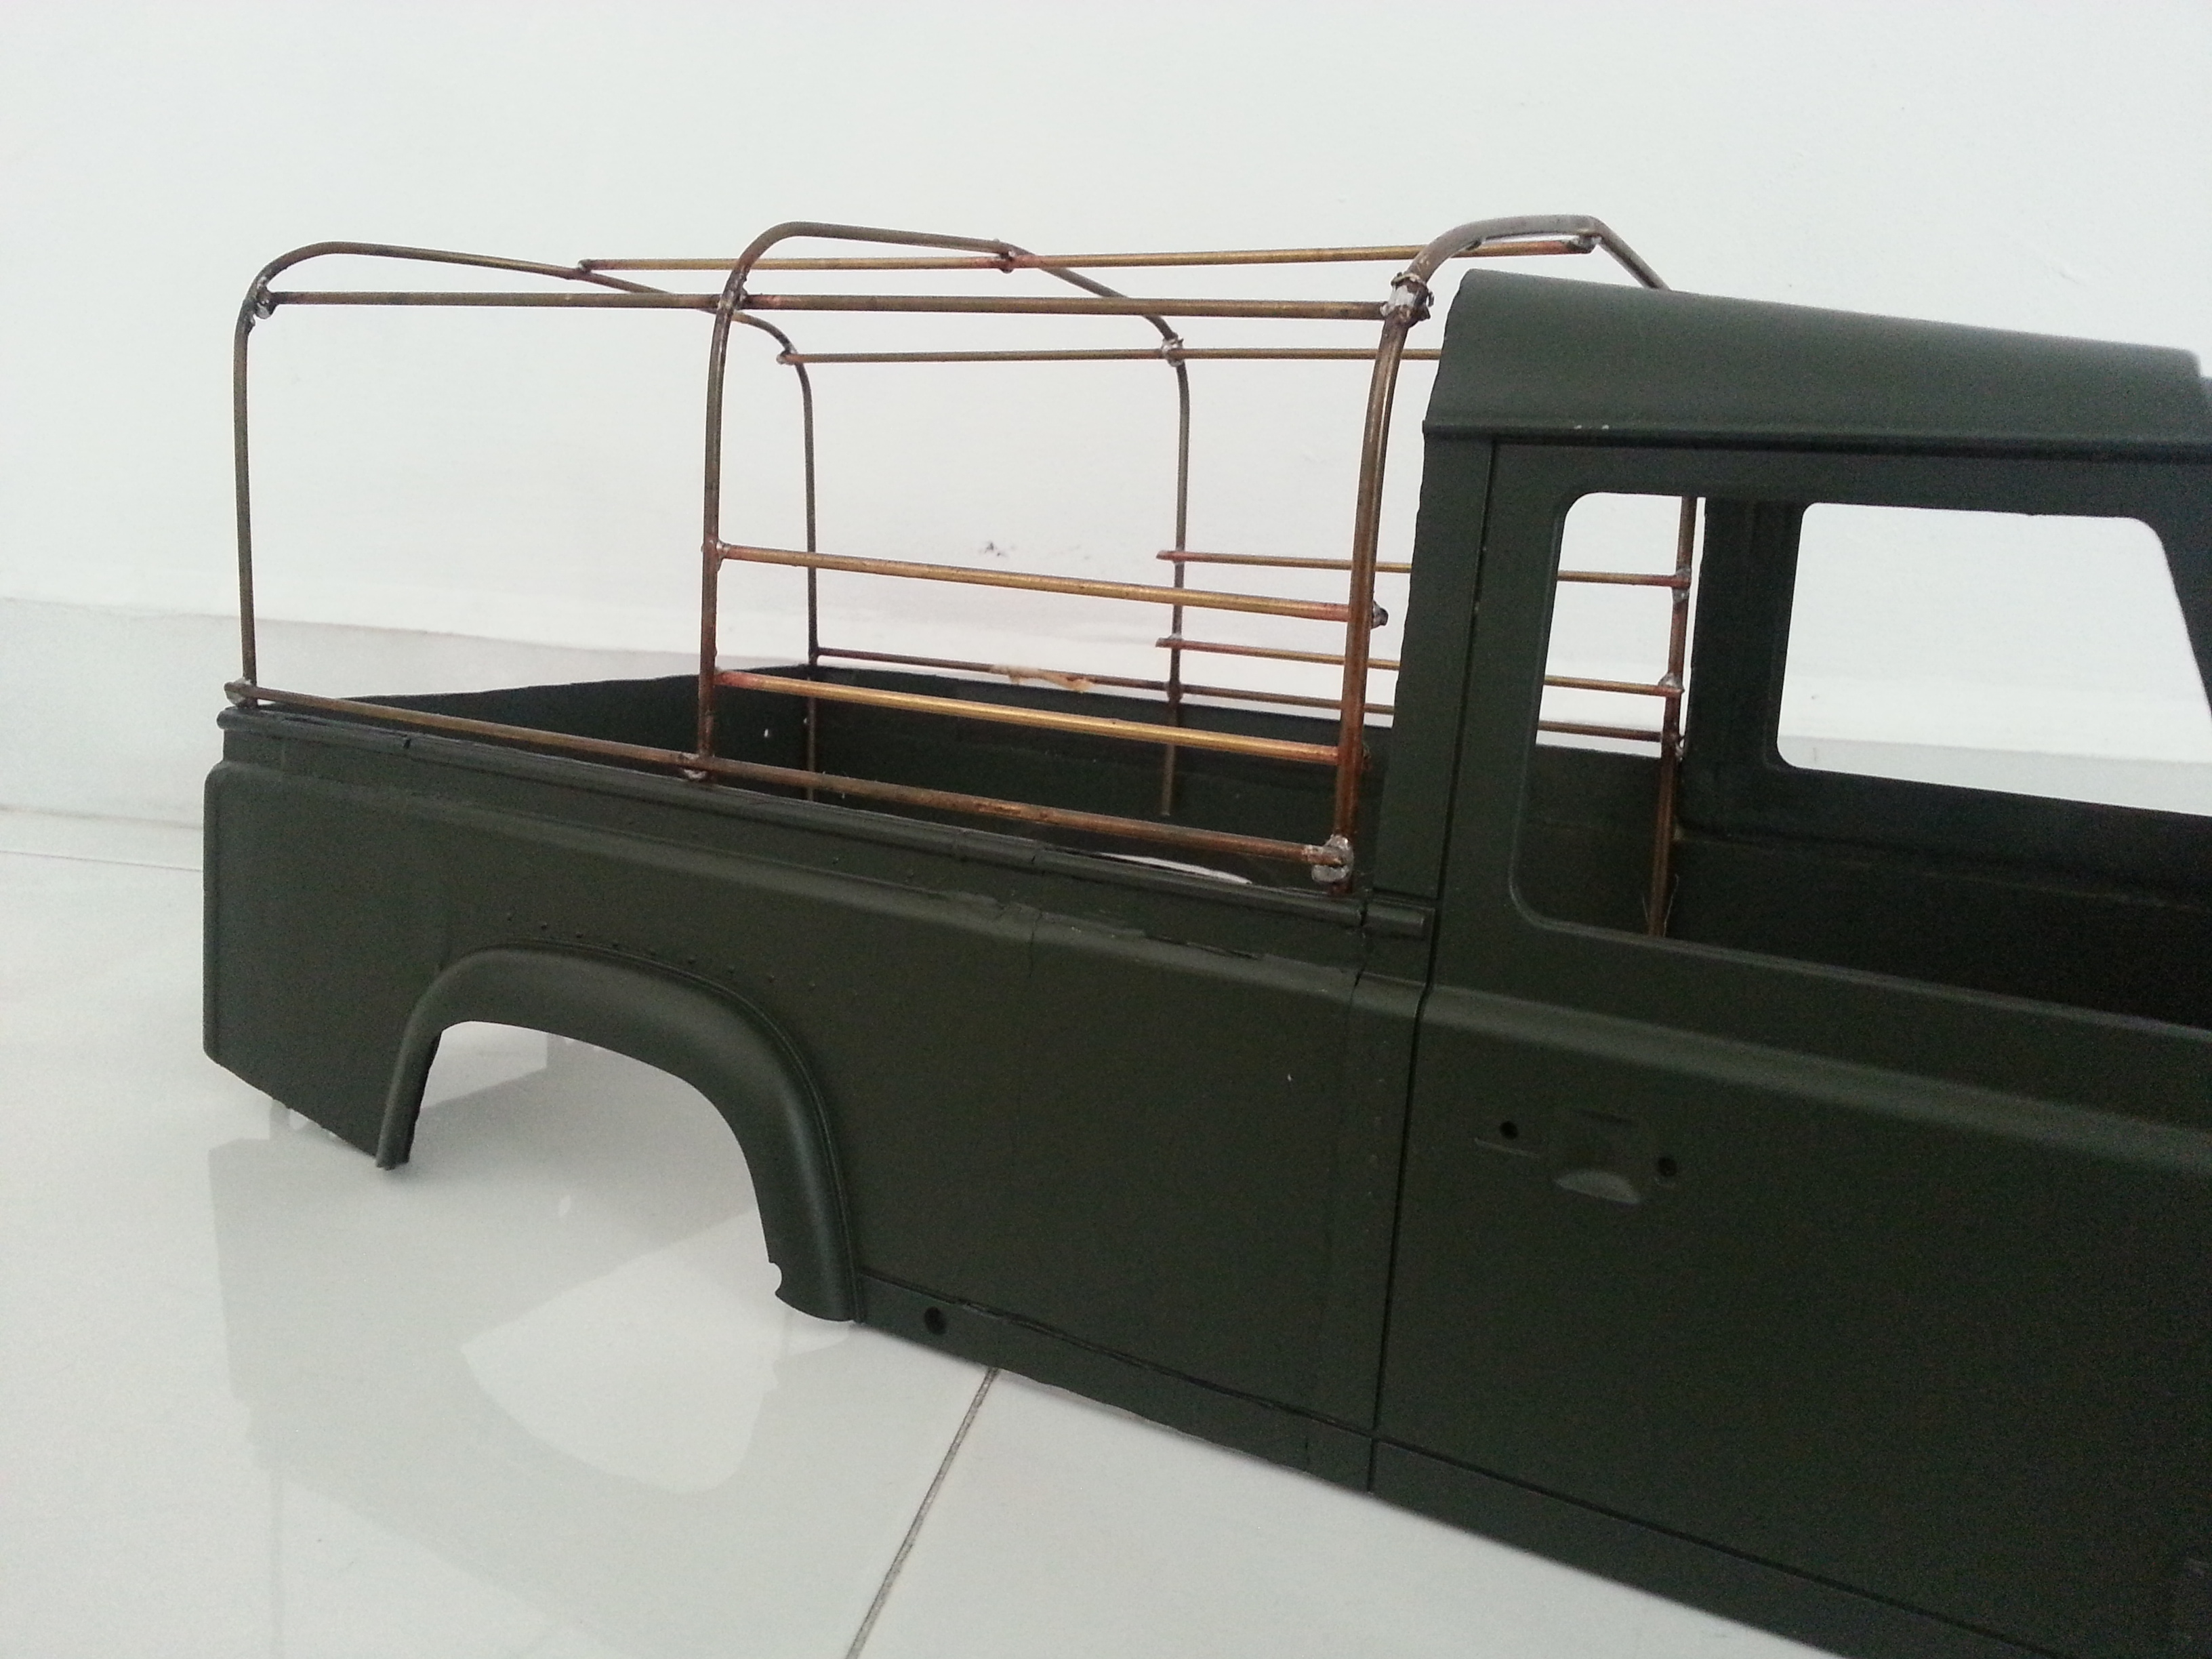 rover - BabyBoy's Land Rover D110 V2 - Page 2 14989571777_40b5a1be79_o